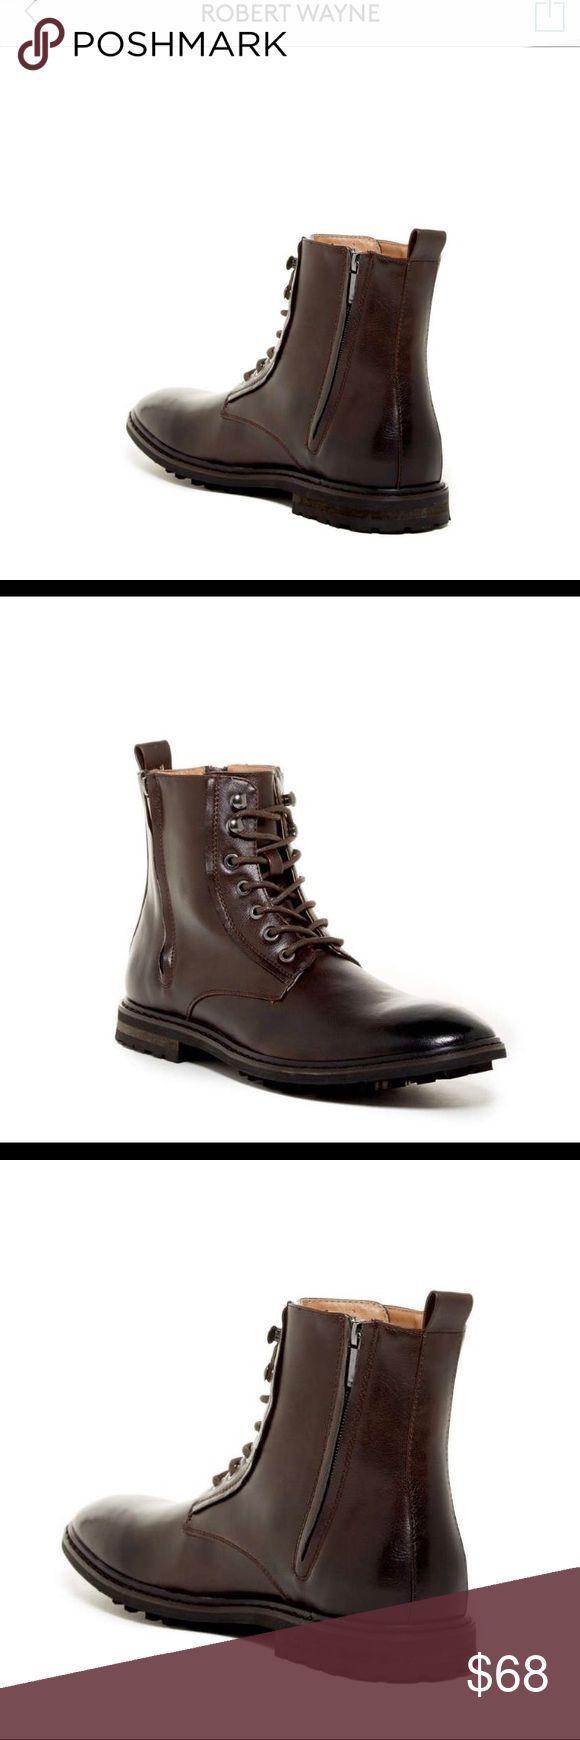 Robert Wayne Latcher Lace-Up Boot  US 10 SALE🔥 Memorial Day Weekend Sale🔥 Robert Wayne Latcher Lace-Up Boot Brown US Men Size 10 $90 Retail. Make me an offer Robert Wayne Shoes Boots